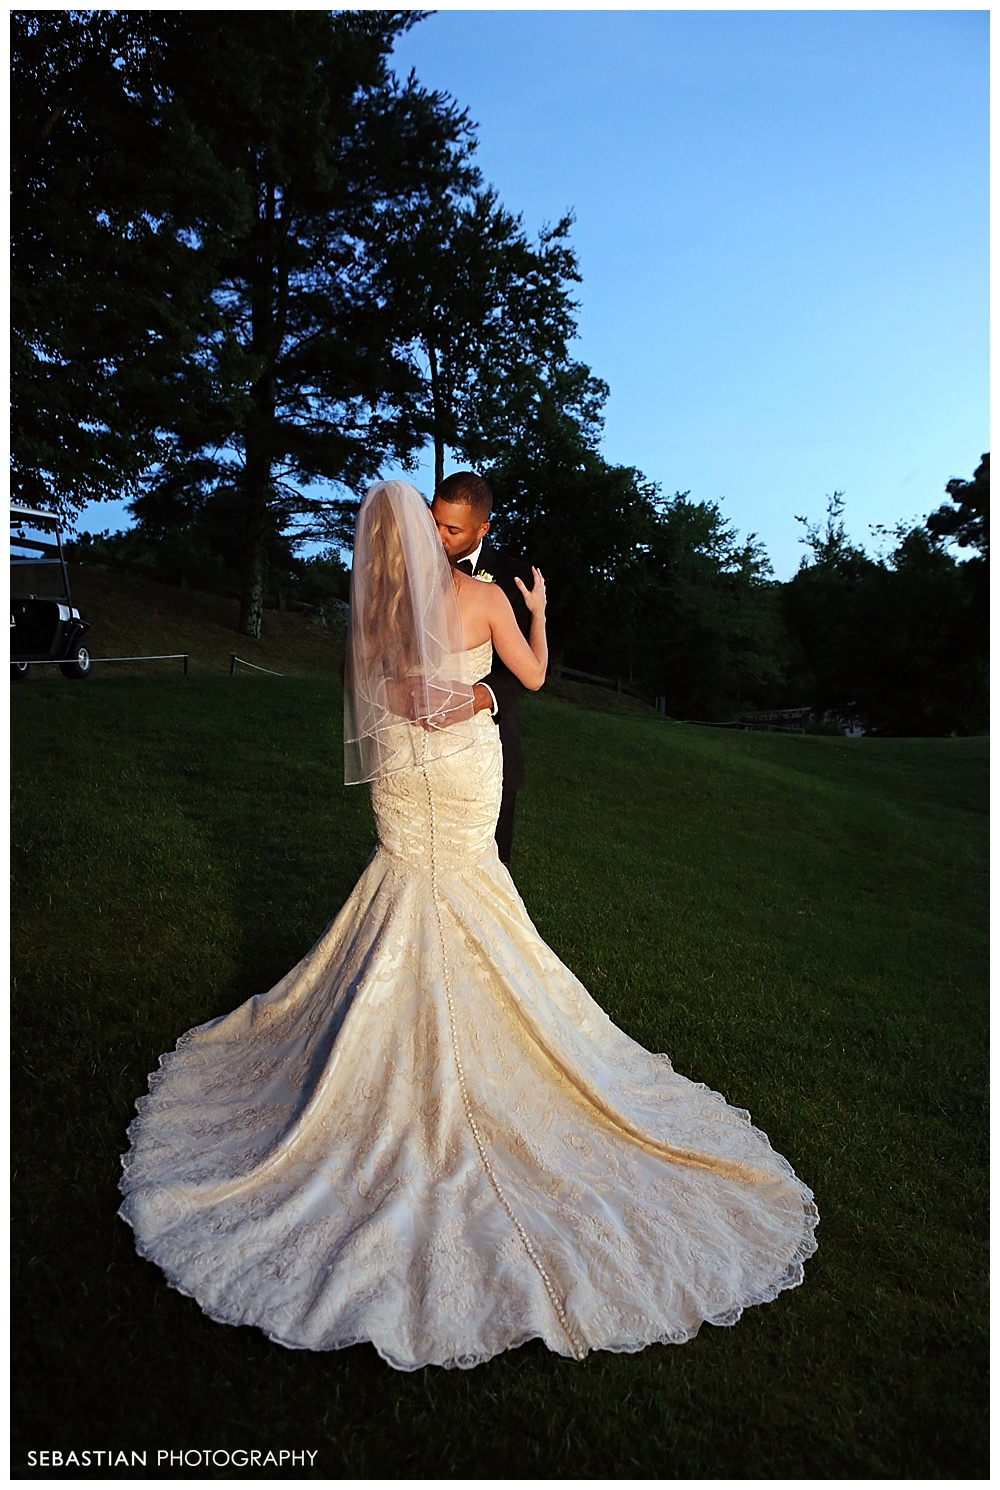 CT Wedding Photographer_Sebastian Photography_Lake of Isles_Outdoor Wedding_Murray_Bransford1042.jpg